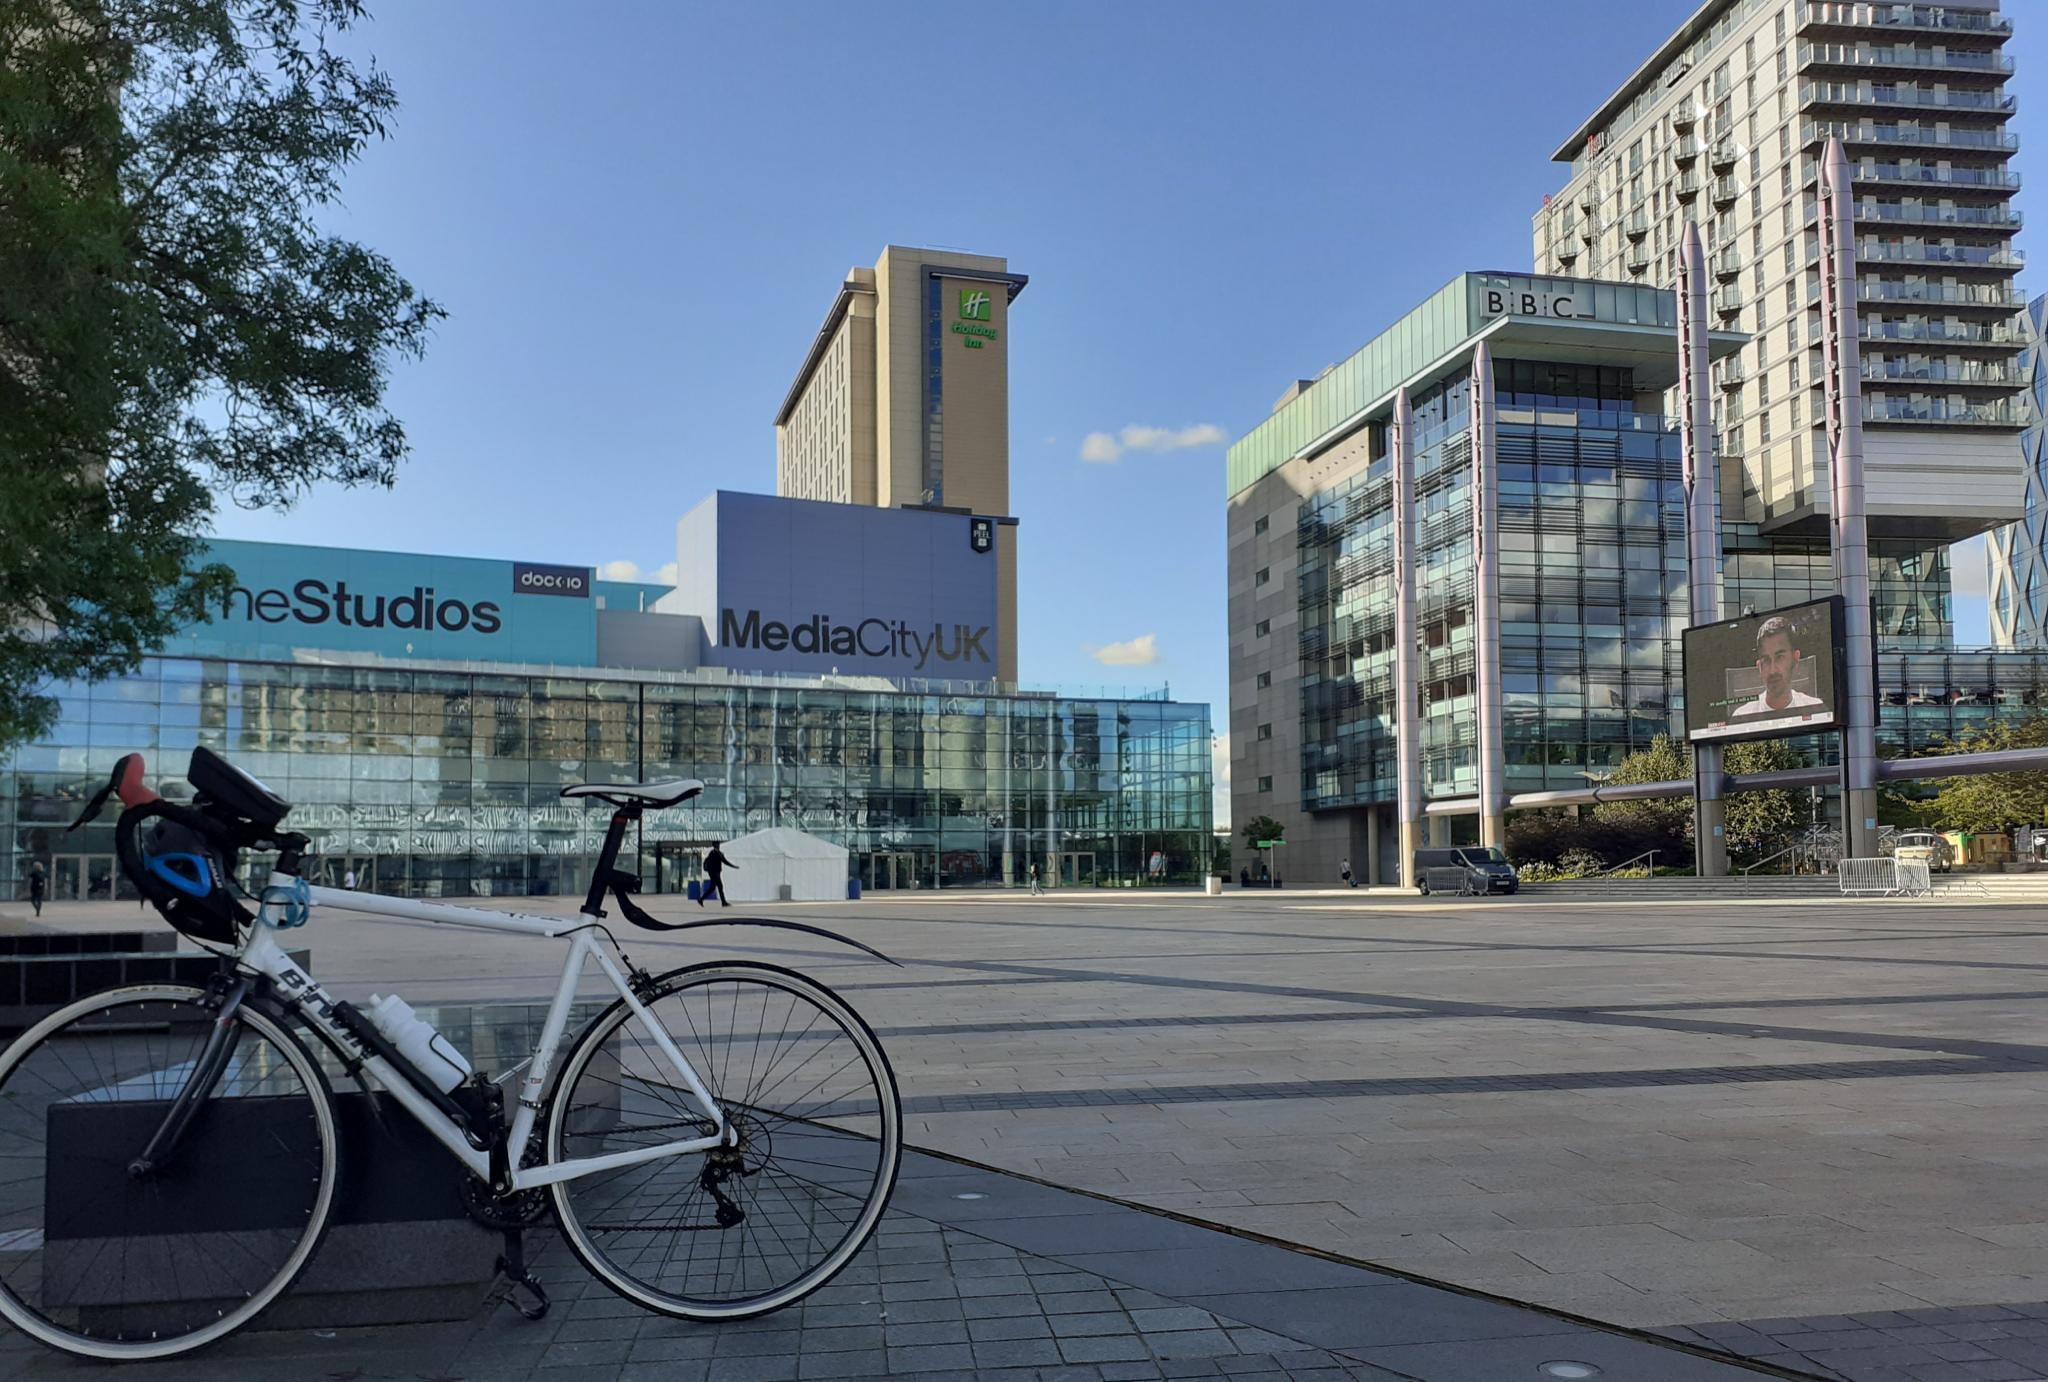 On my bike-20200803_195443-jpg